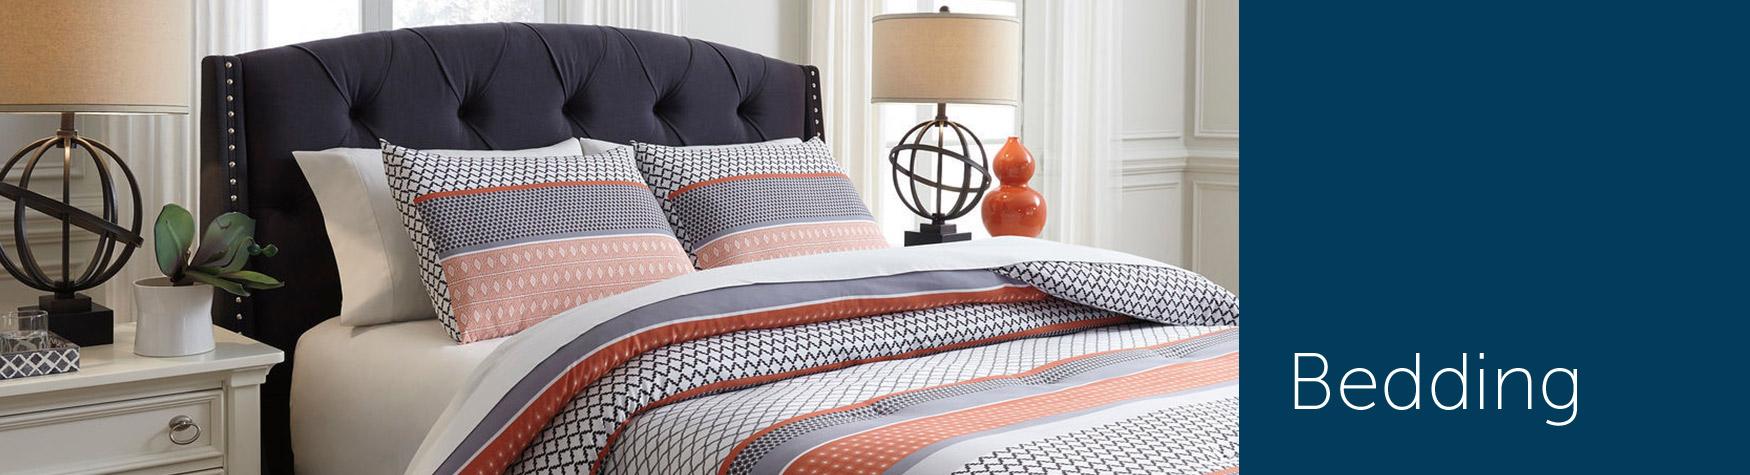 bedding-banner.jpg